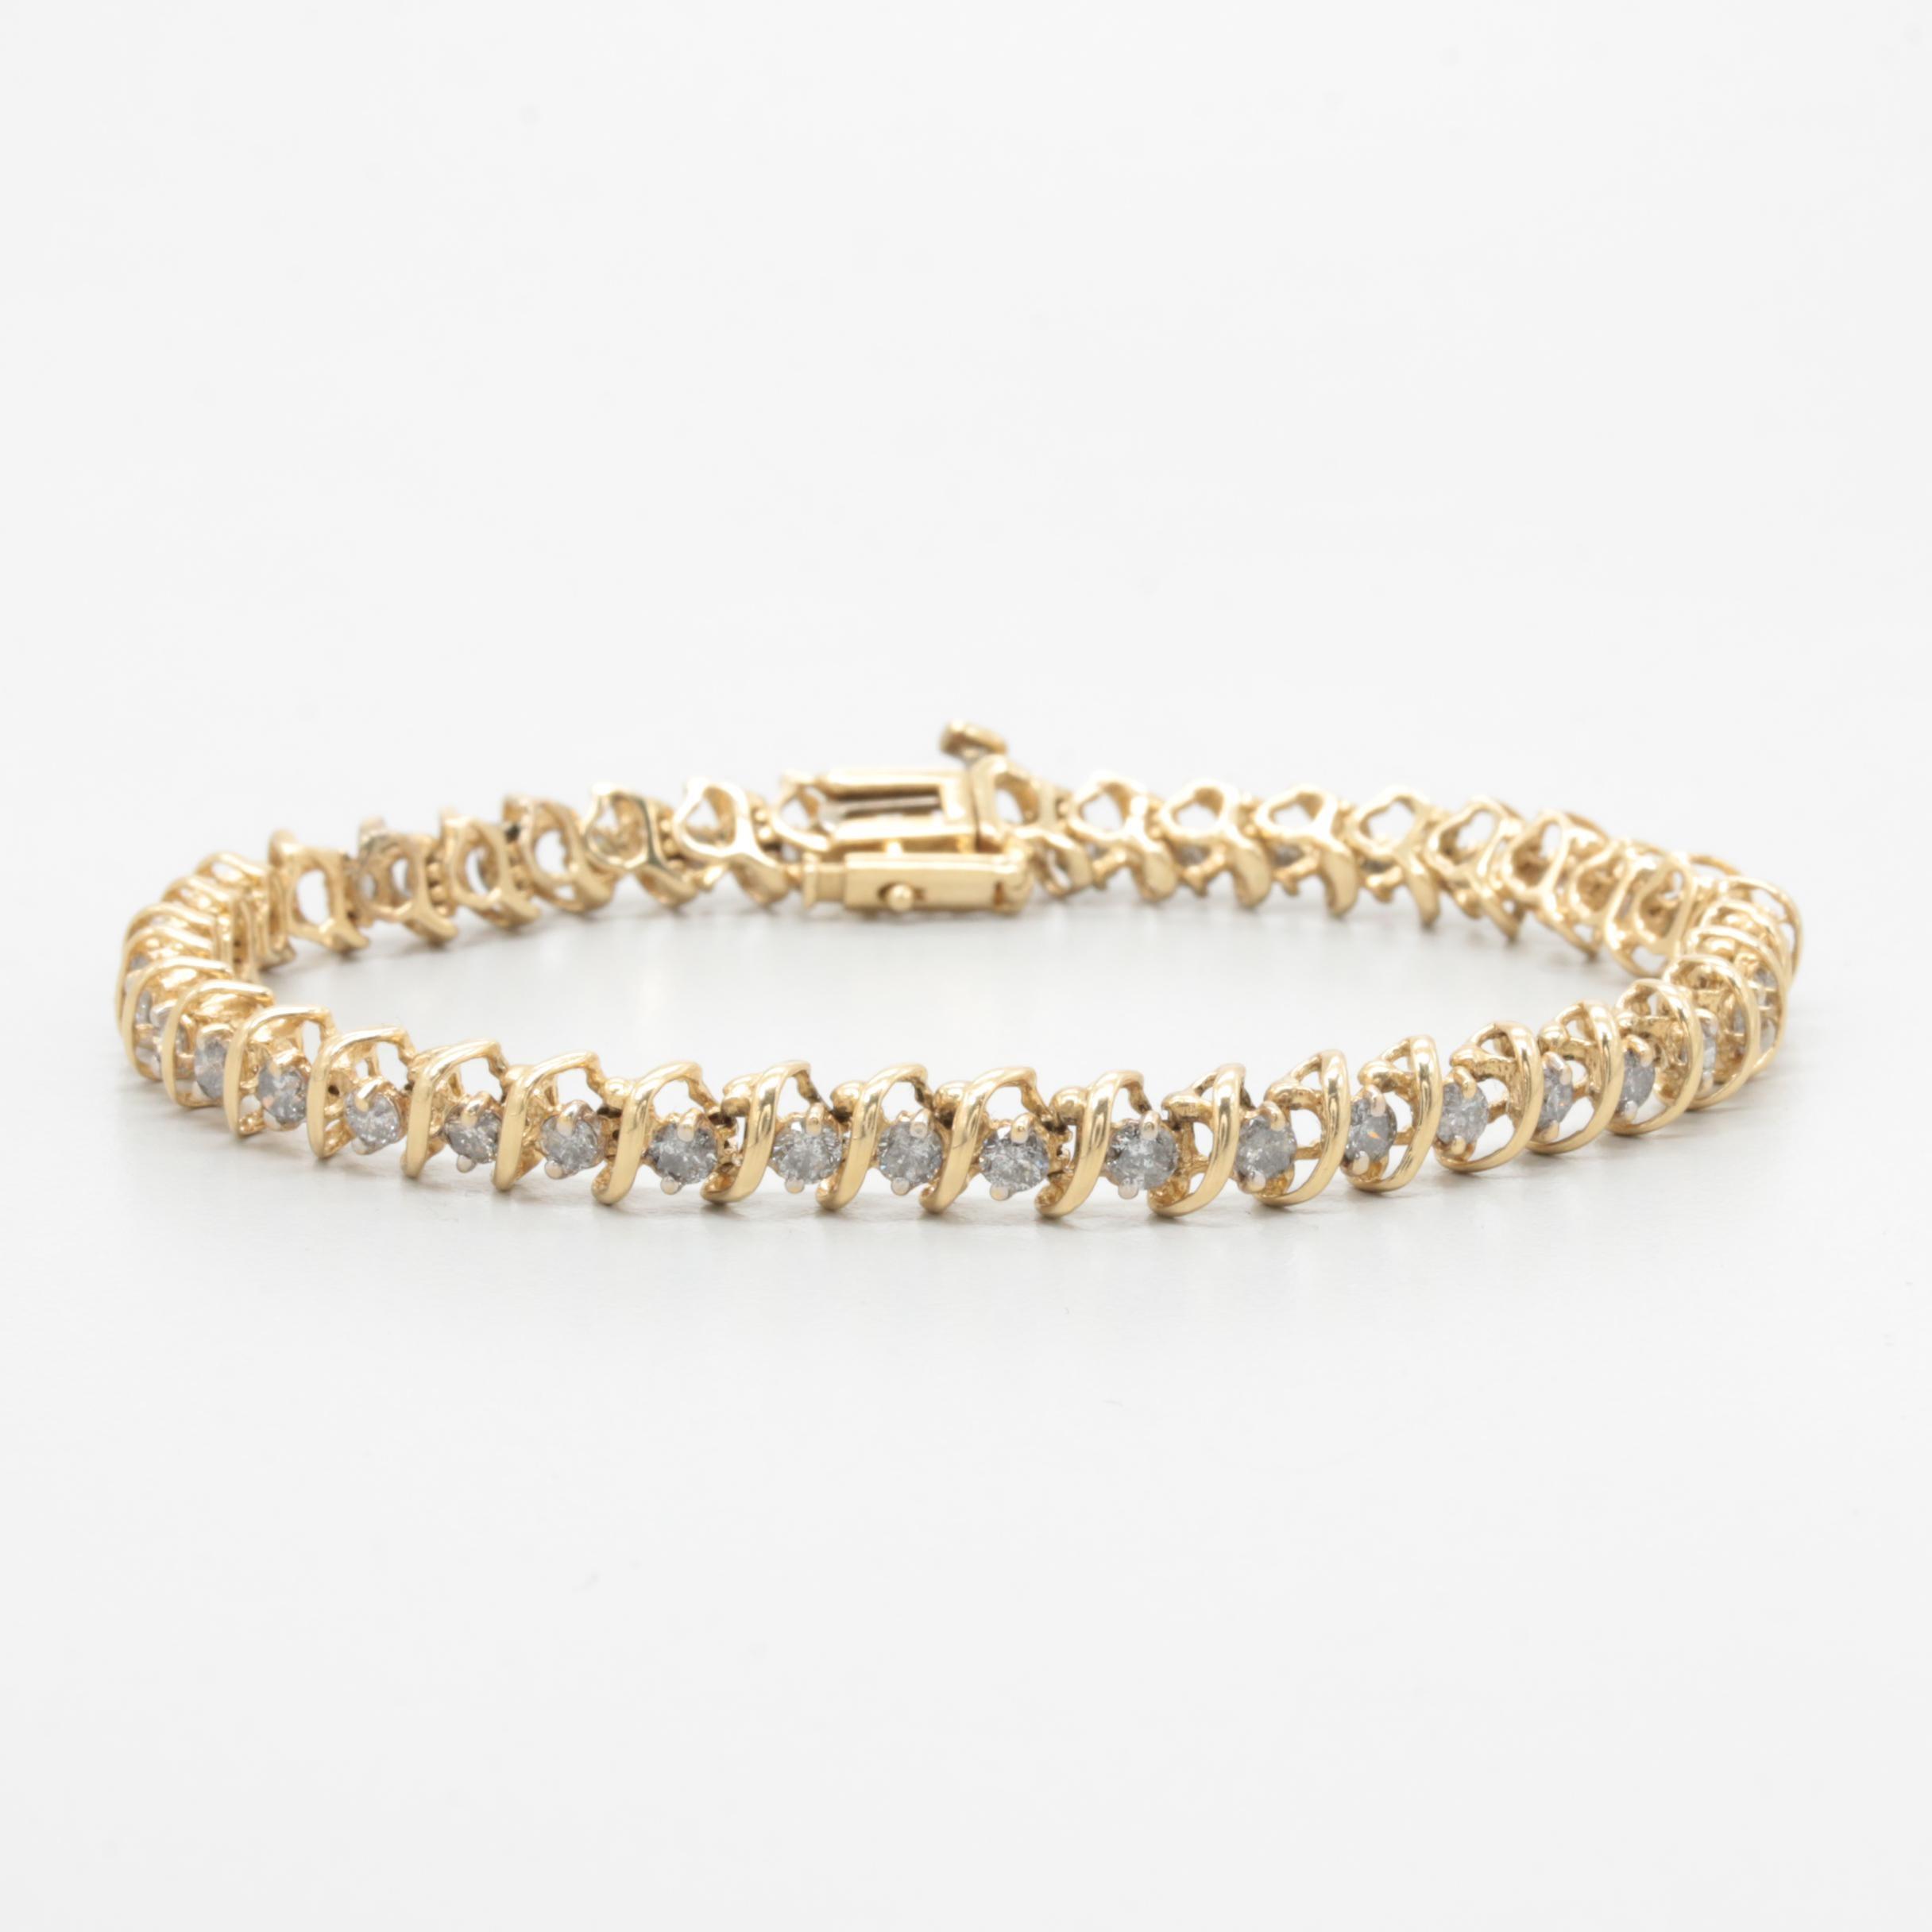 14K Yellow Gold Diamond 2.75 ctw Tennis Bracelet